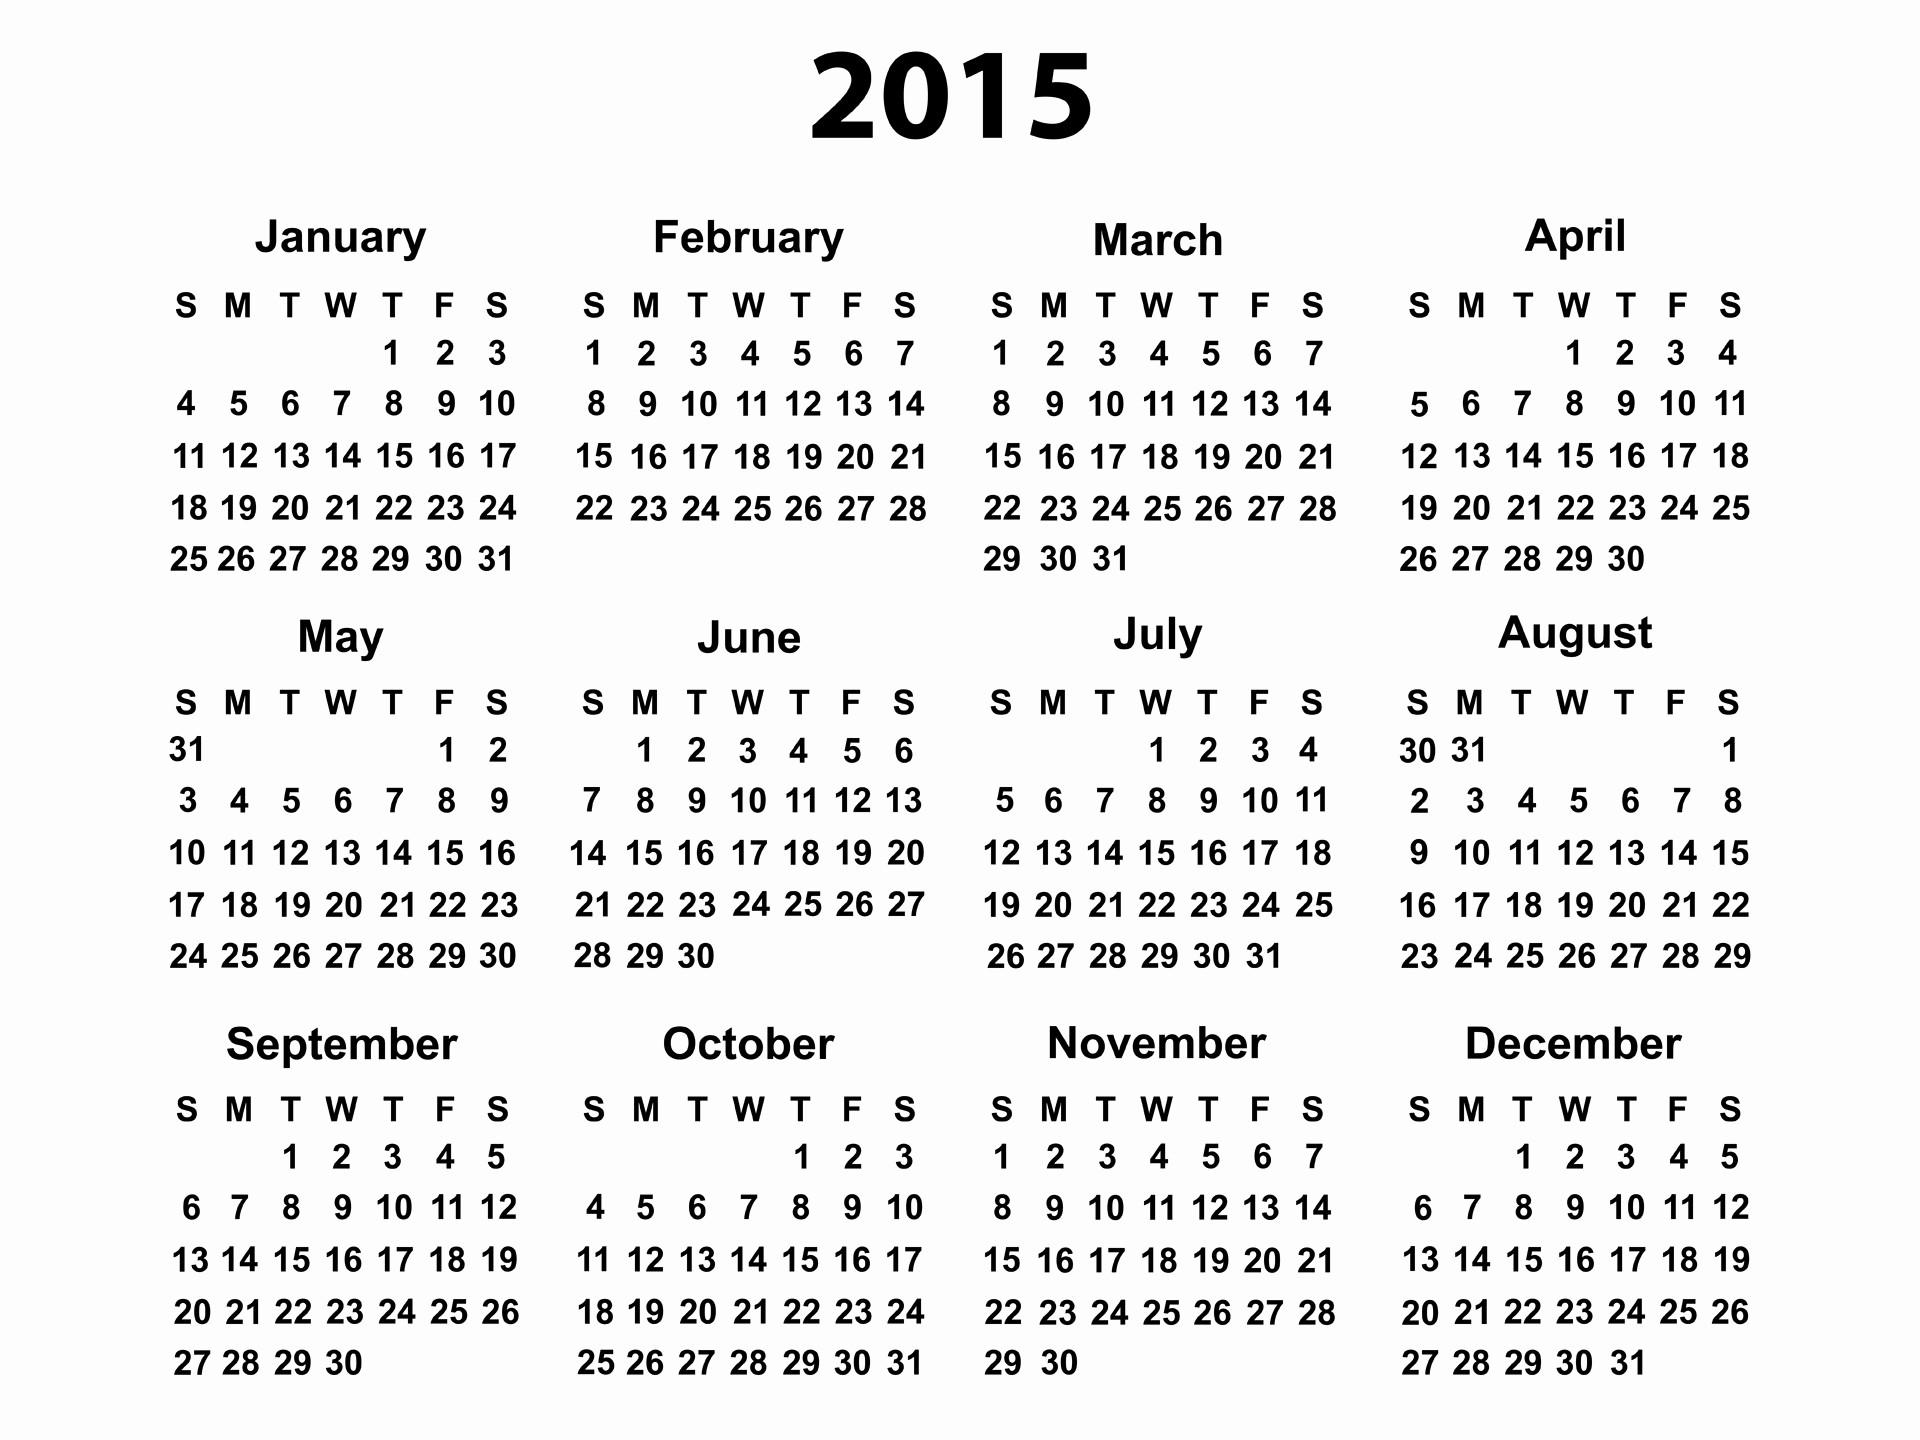 Free Monthly Calendar Templates 2015 Lovely 2015 Calendar Printable Free